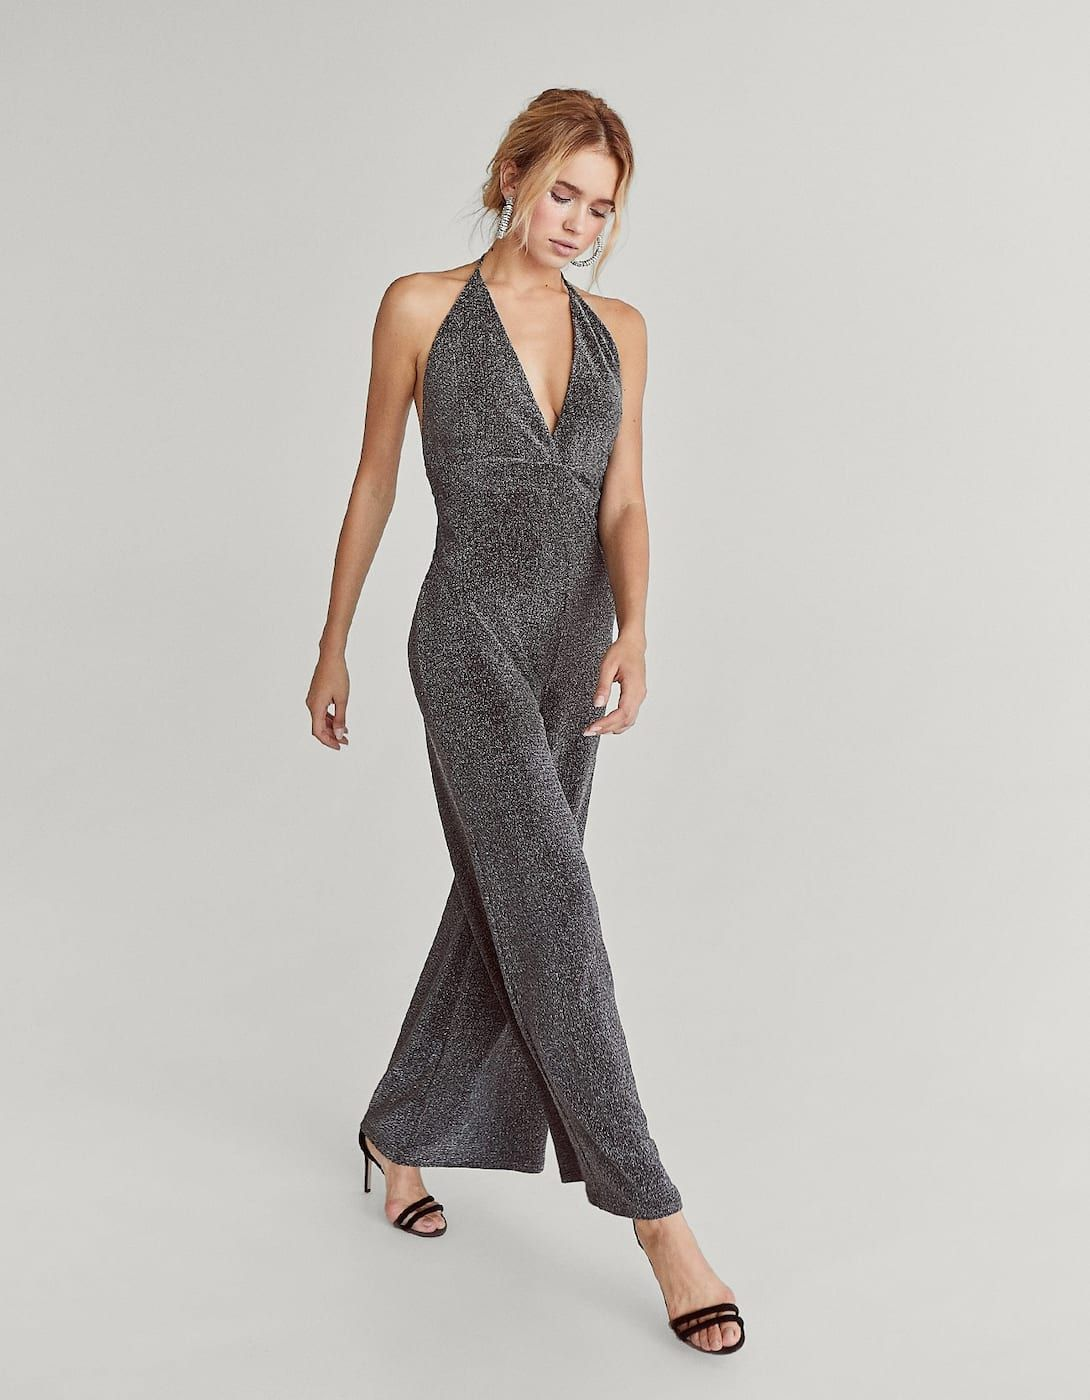 7c6e718c50e6 Halter neck jumpsuit with metallic thread - Dresses